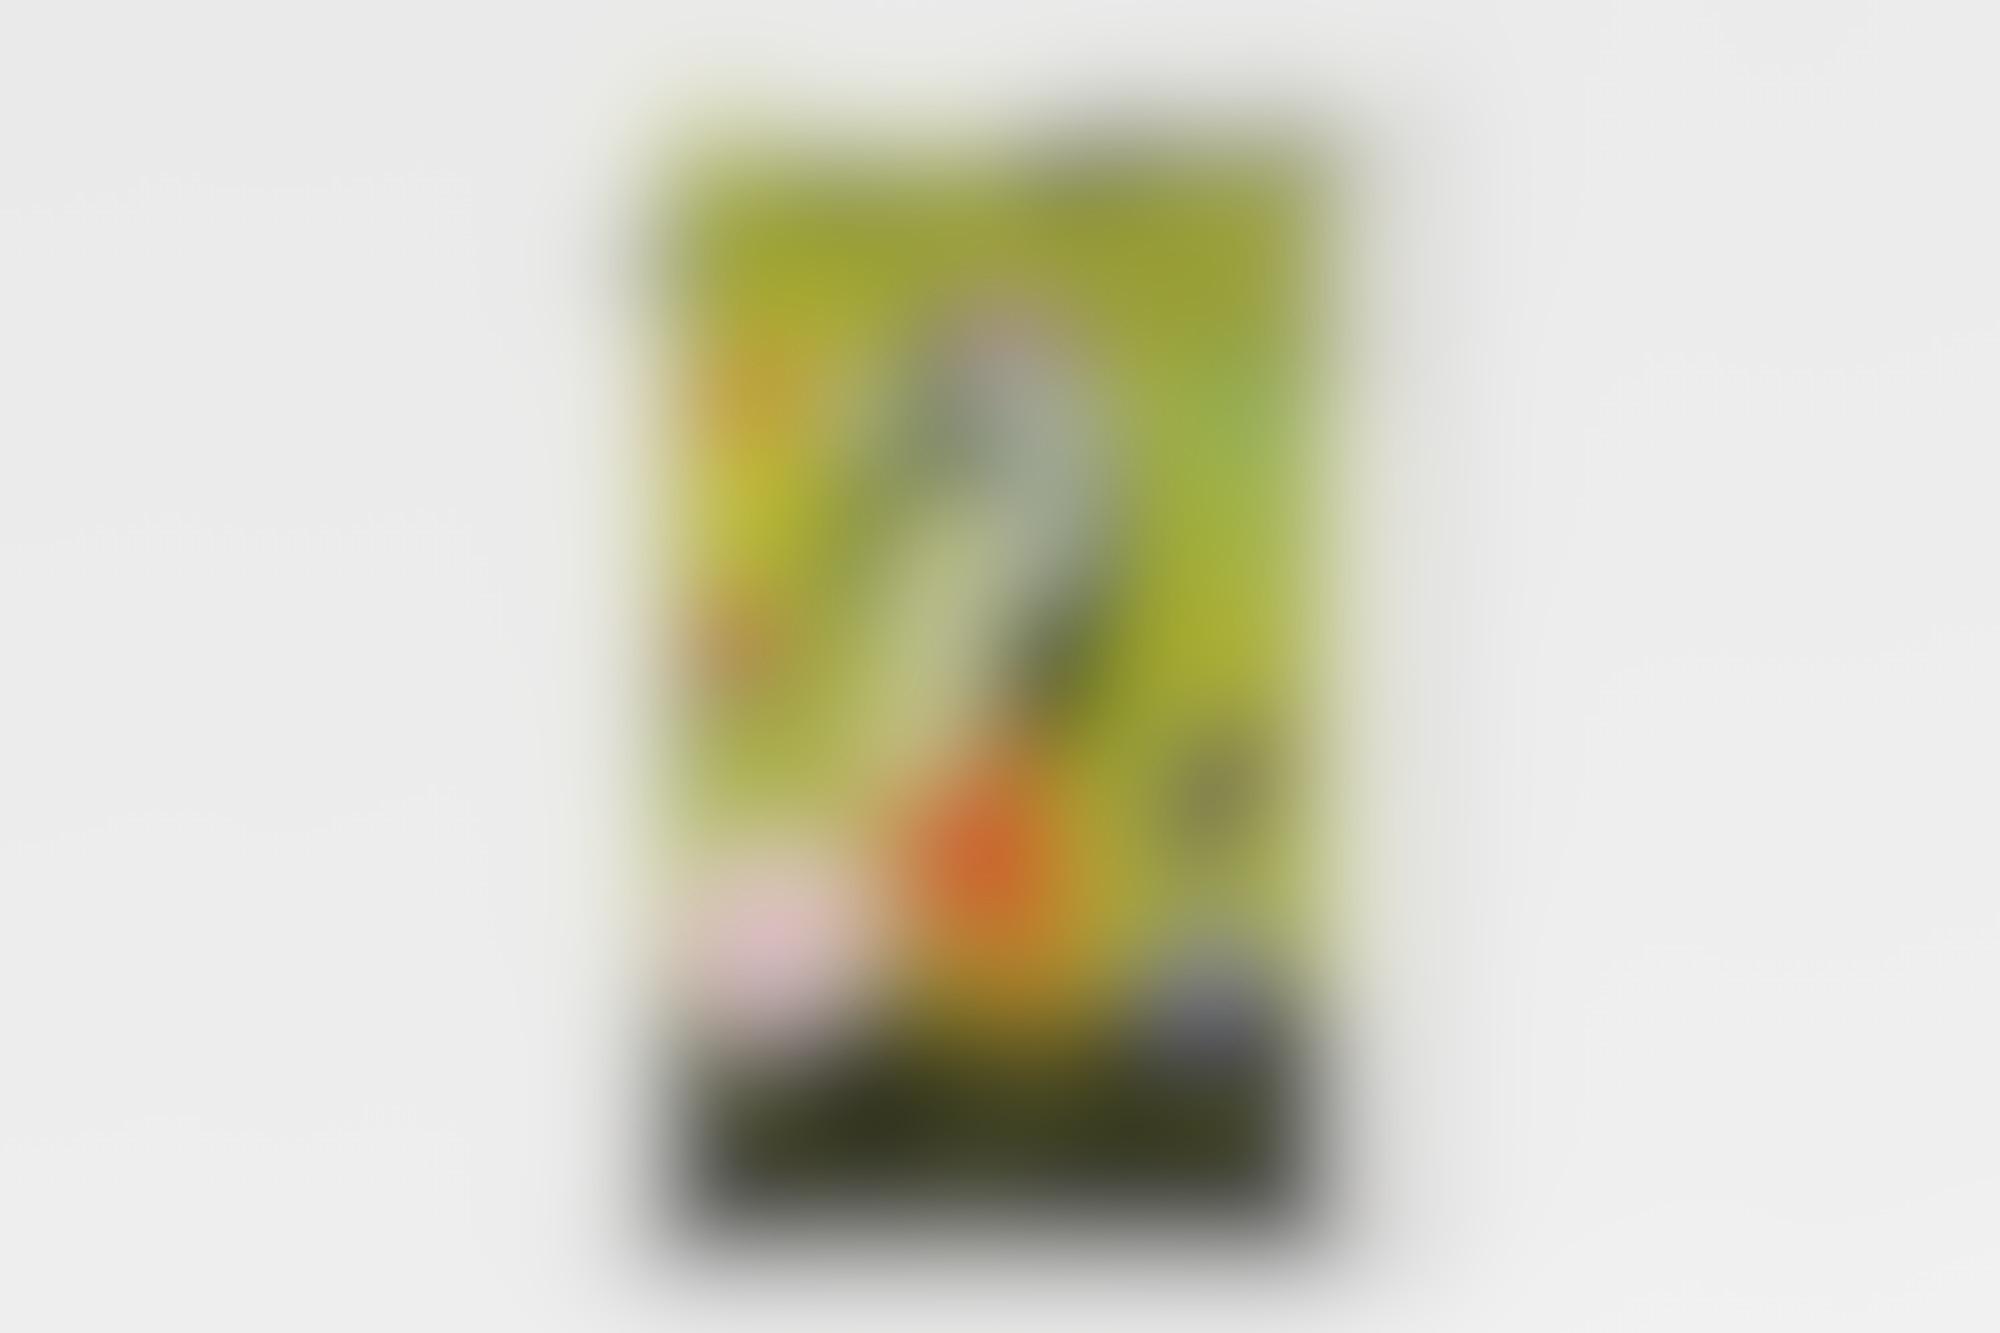 Paul Mann YCC All Killer No Filler Event Poster autocompressfitresizeixlibphp 1 1 0max h2000max w3 D2000q80sbf484b678185f40a26921ed07d79bdf0